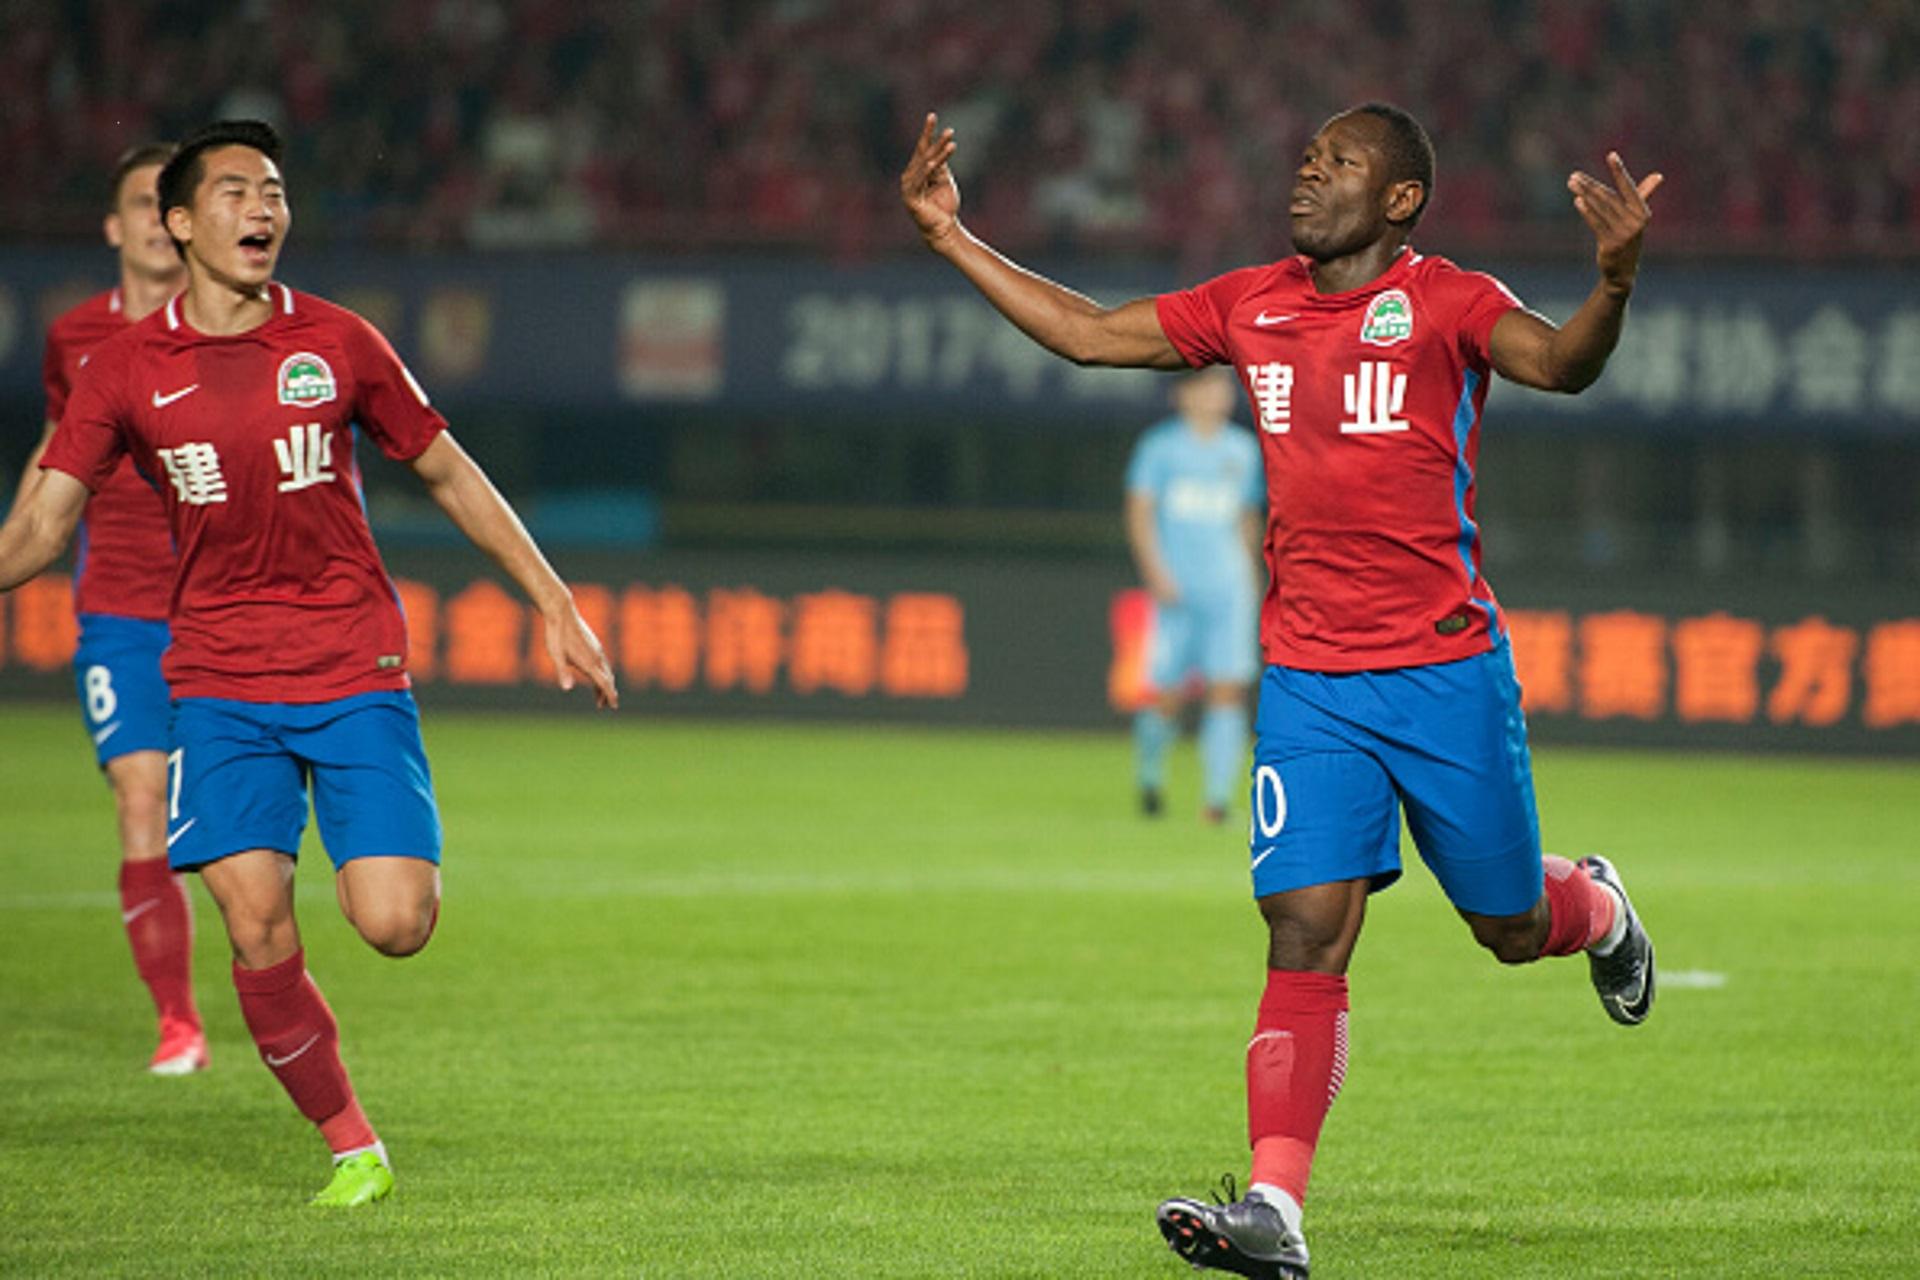 Cameroon star Bassogog rescues Shanghai Shenhua from defeat against Shanghai Port